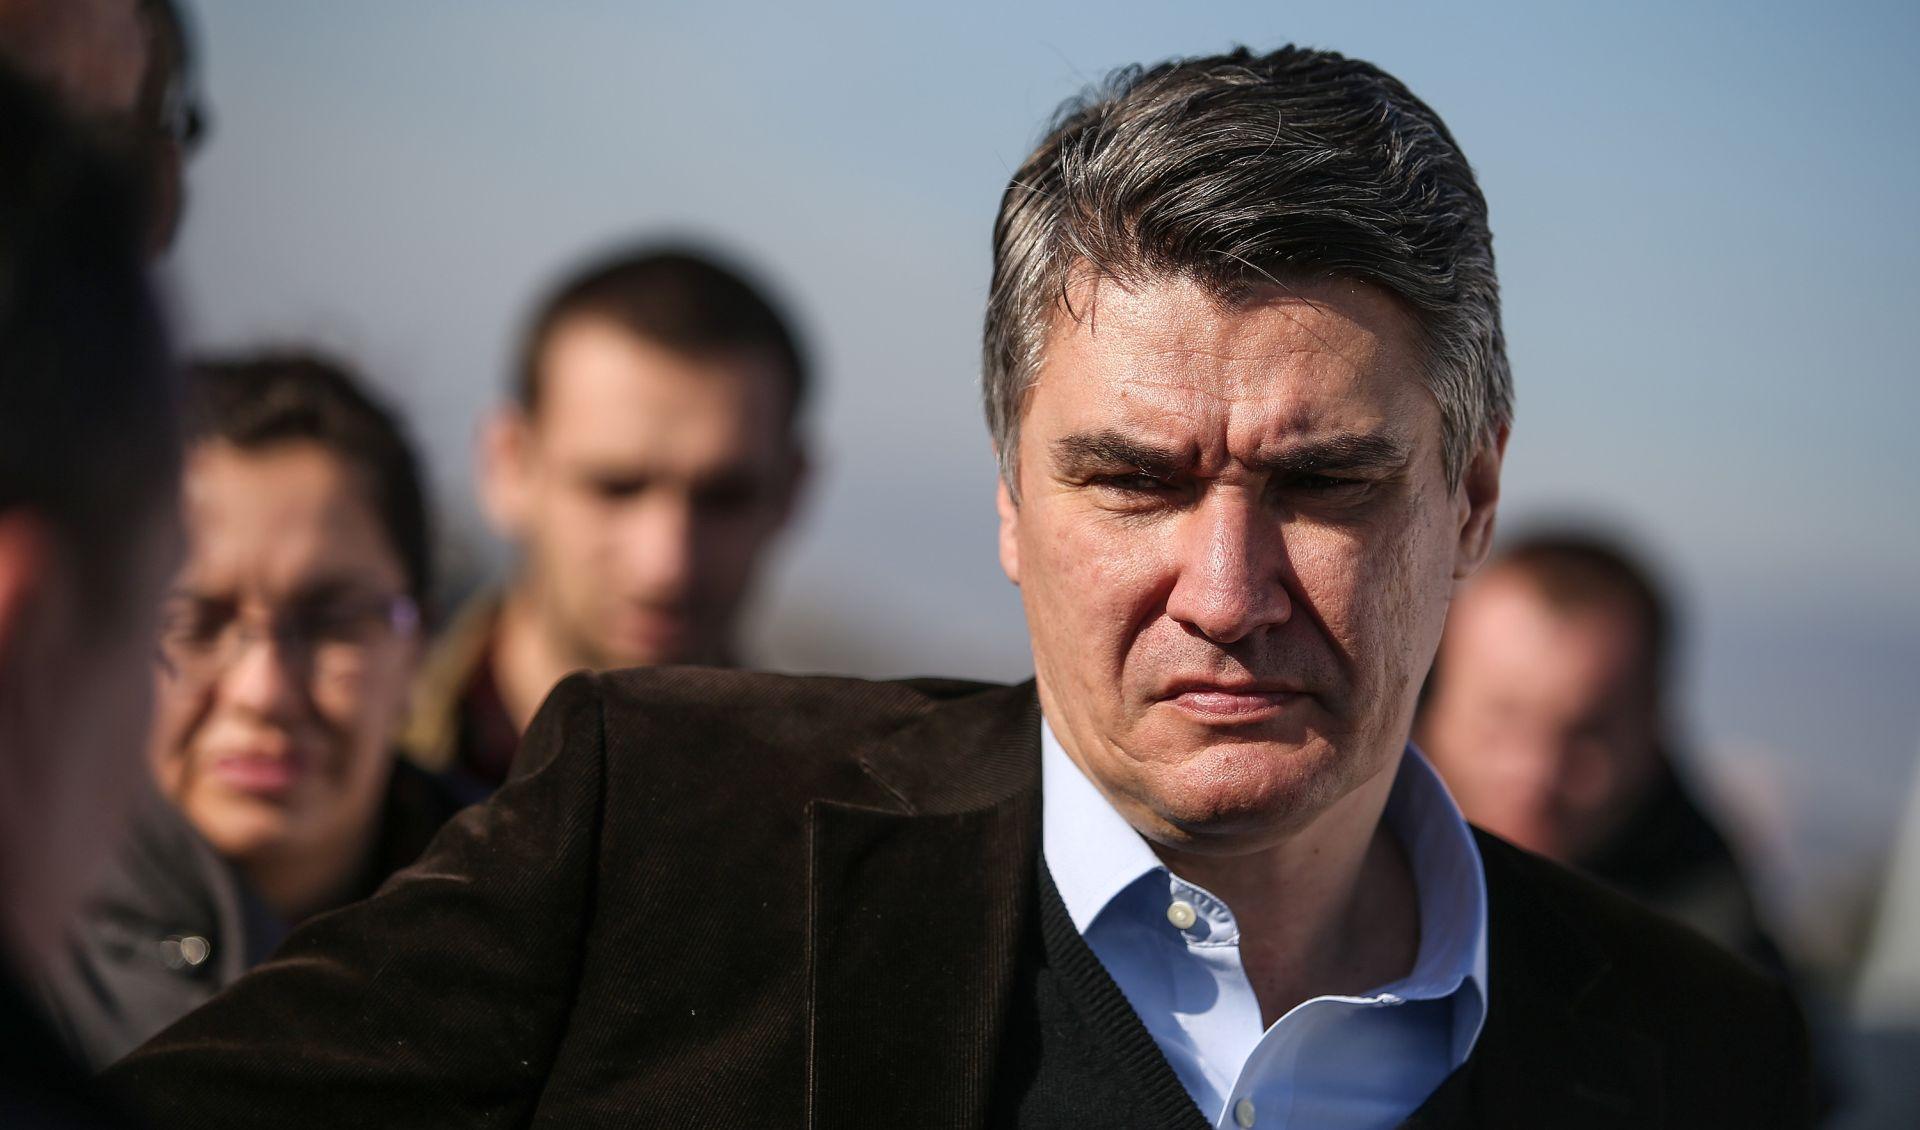 IZBORI 2015. Milanović: Trend podrške birača Vladi je očit